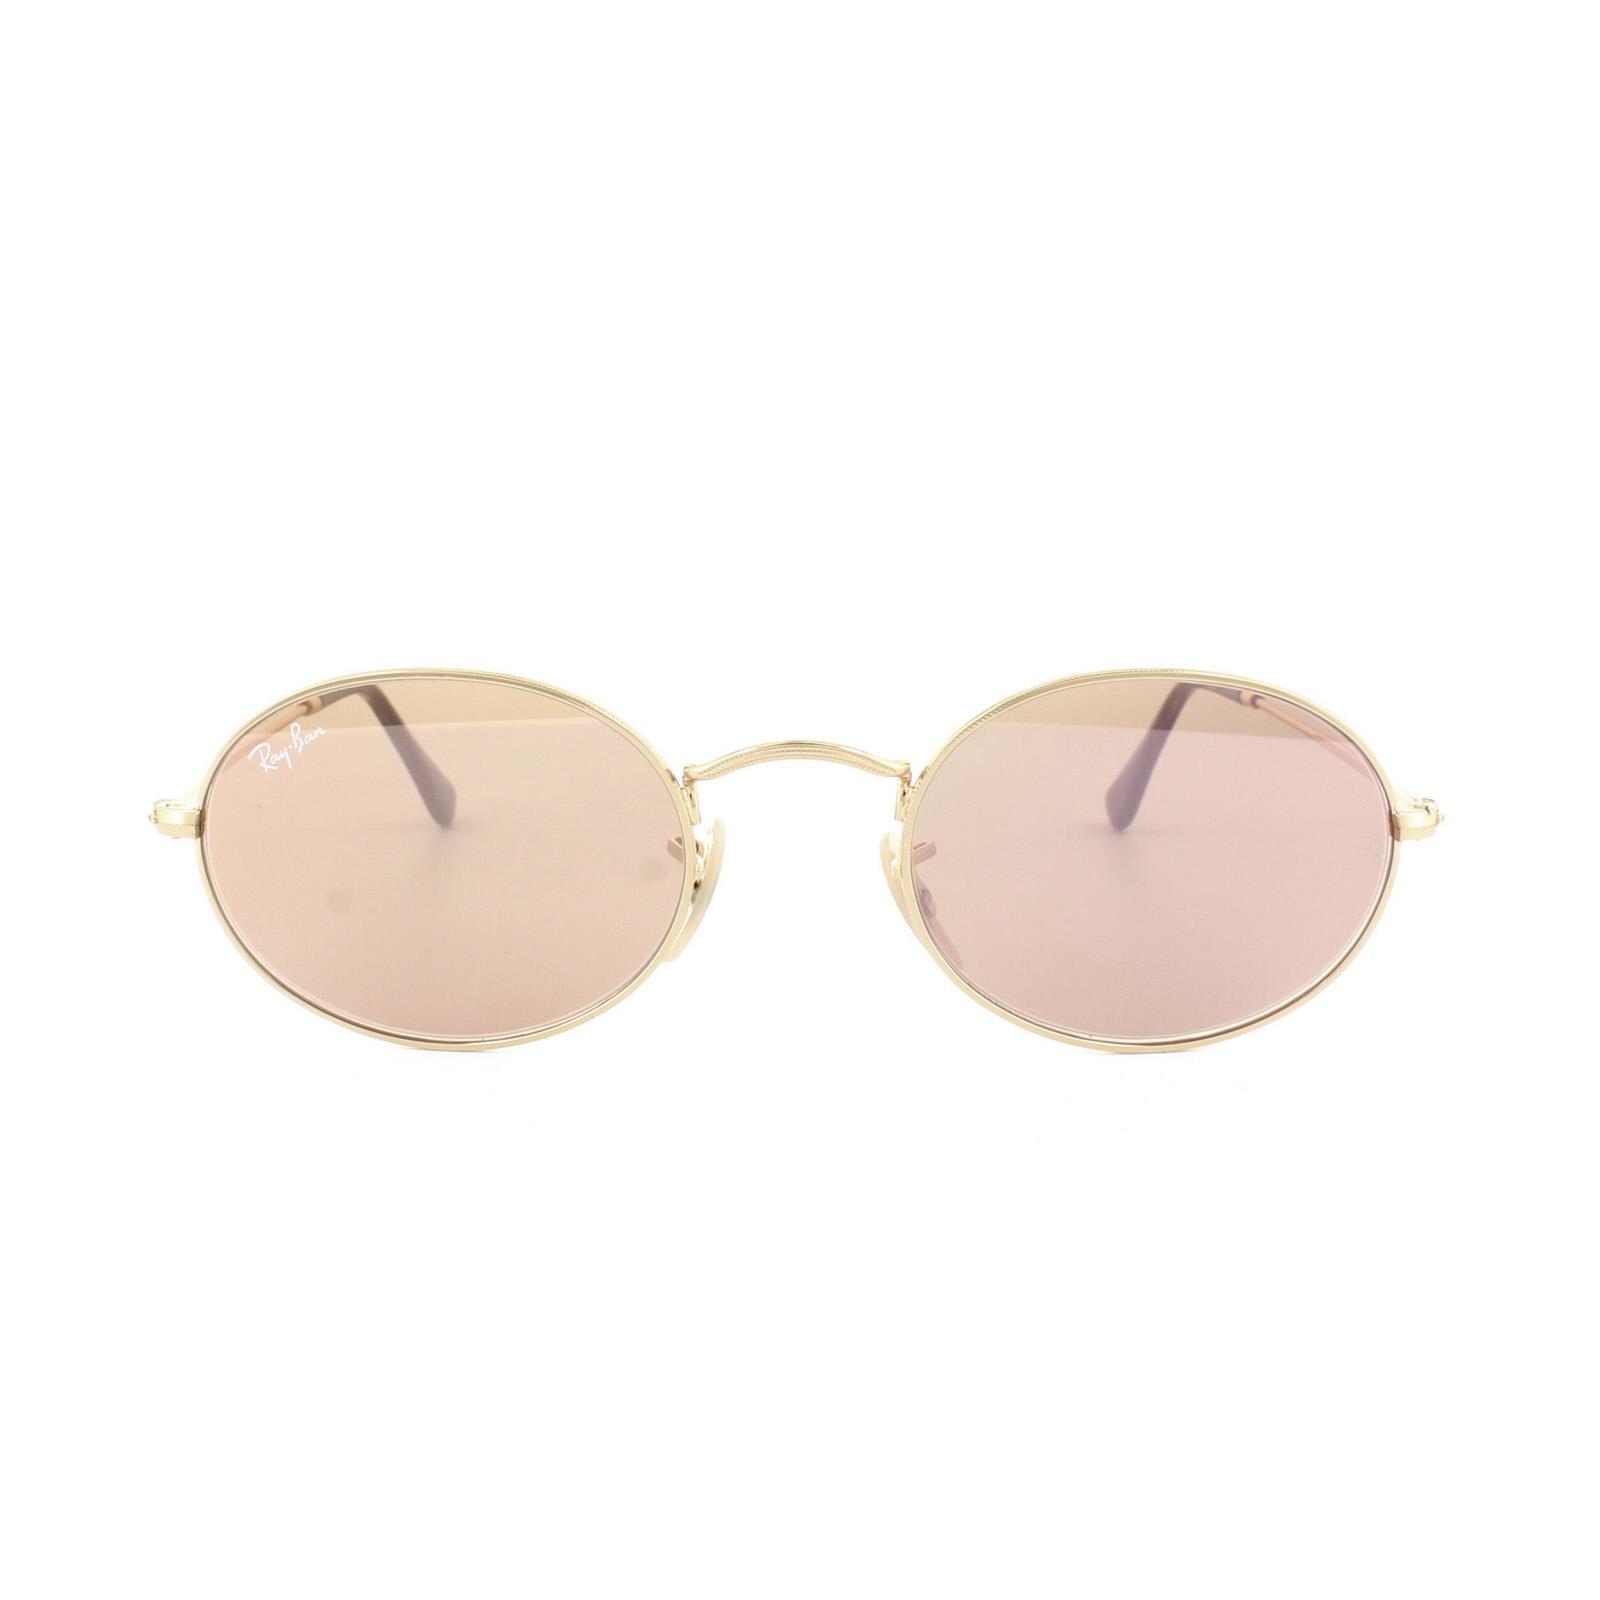 bb40fa7572 CENTINELA Ray-Ban gafas de sol ovaladas 3547N 001 Z2 espejo cobre oro 48mm